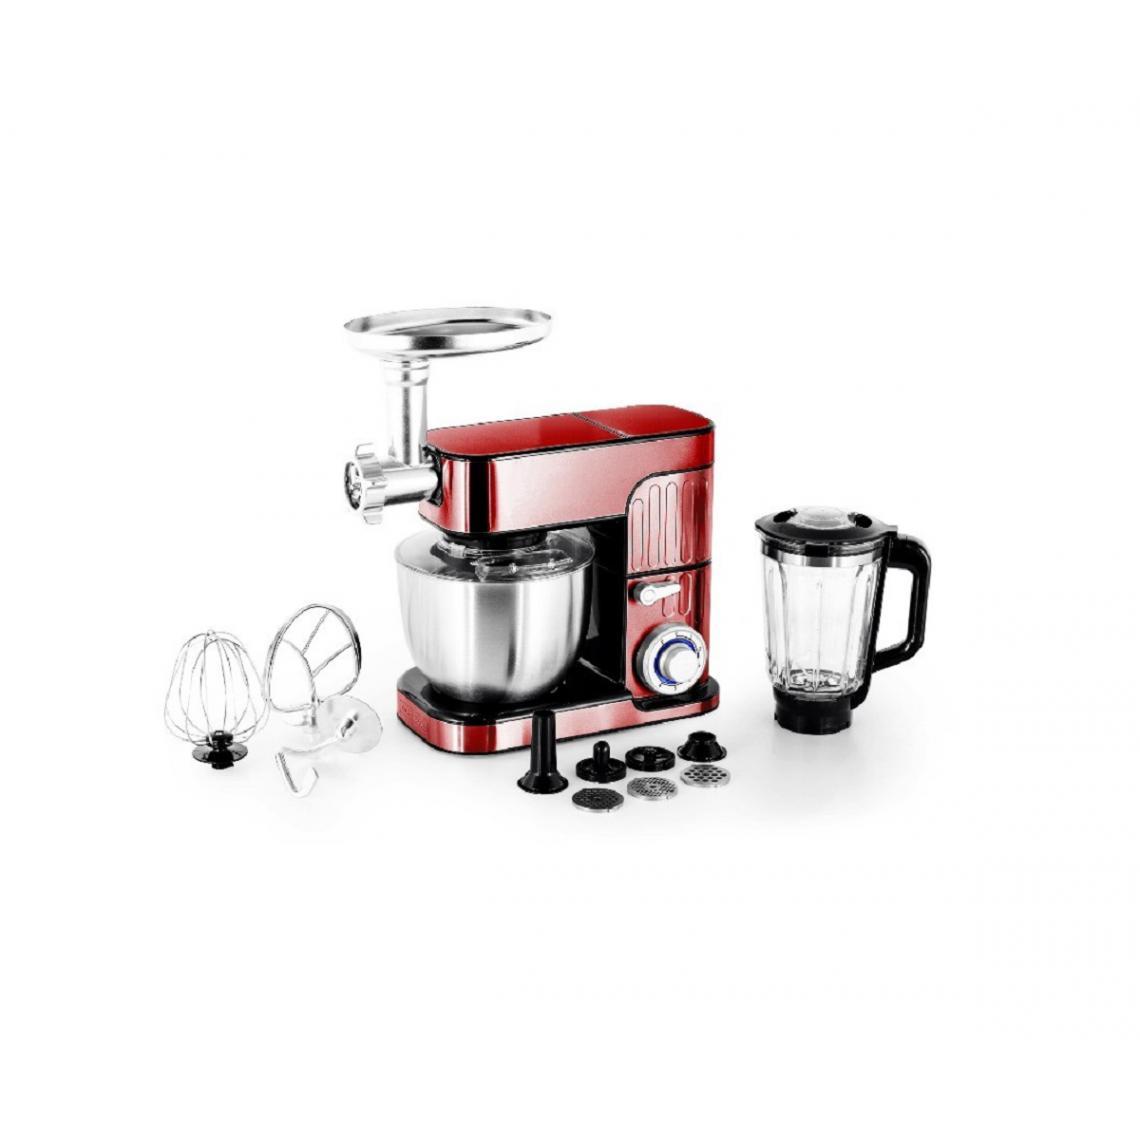 Kitchencook Robot pétrin multifonction Antara Pro - 5.5L - 3 en 1 - 1300W - Inox Rouge